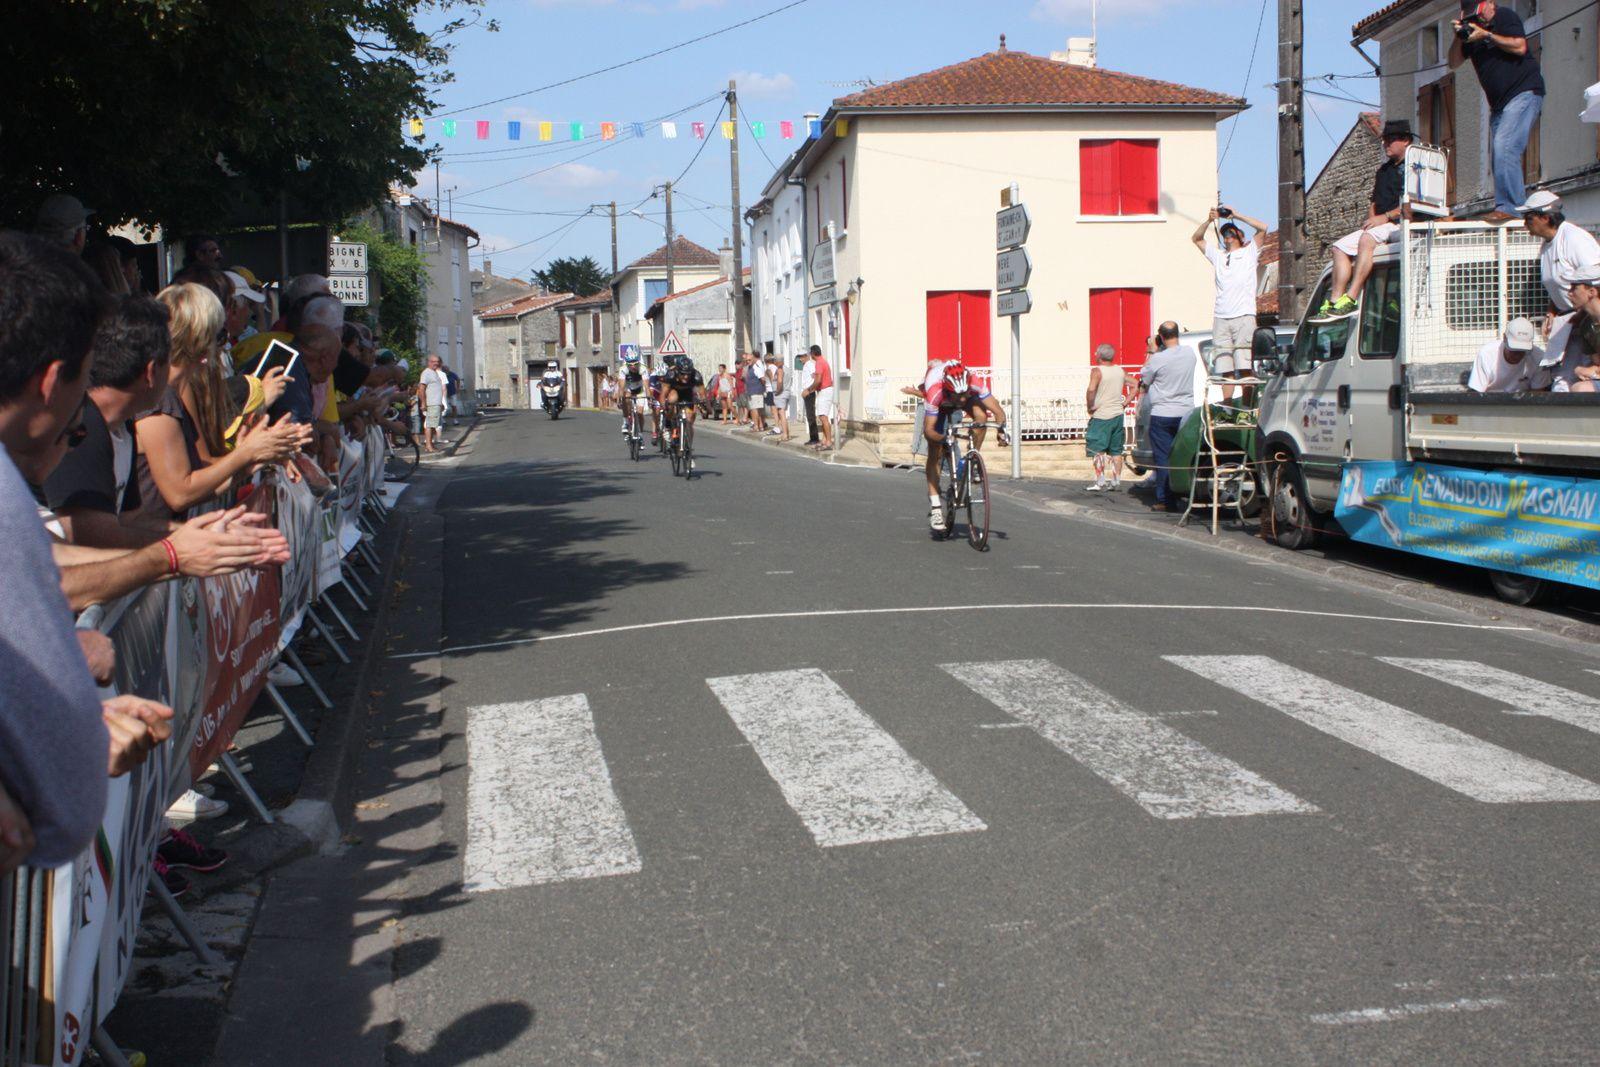 2e  Patrick  BALLANGER(AC  Jarnac-Aigre-Rouillac), 3e  Nicolas  LECLERC(Angouléme  VC), 4e  Vincent  GUEDON(VC  Rivesaldes), 5e  Francis  FEMANDY(AC  Jarnac-Aigre-Rouillac)